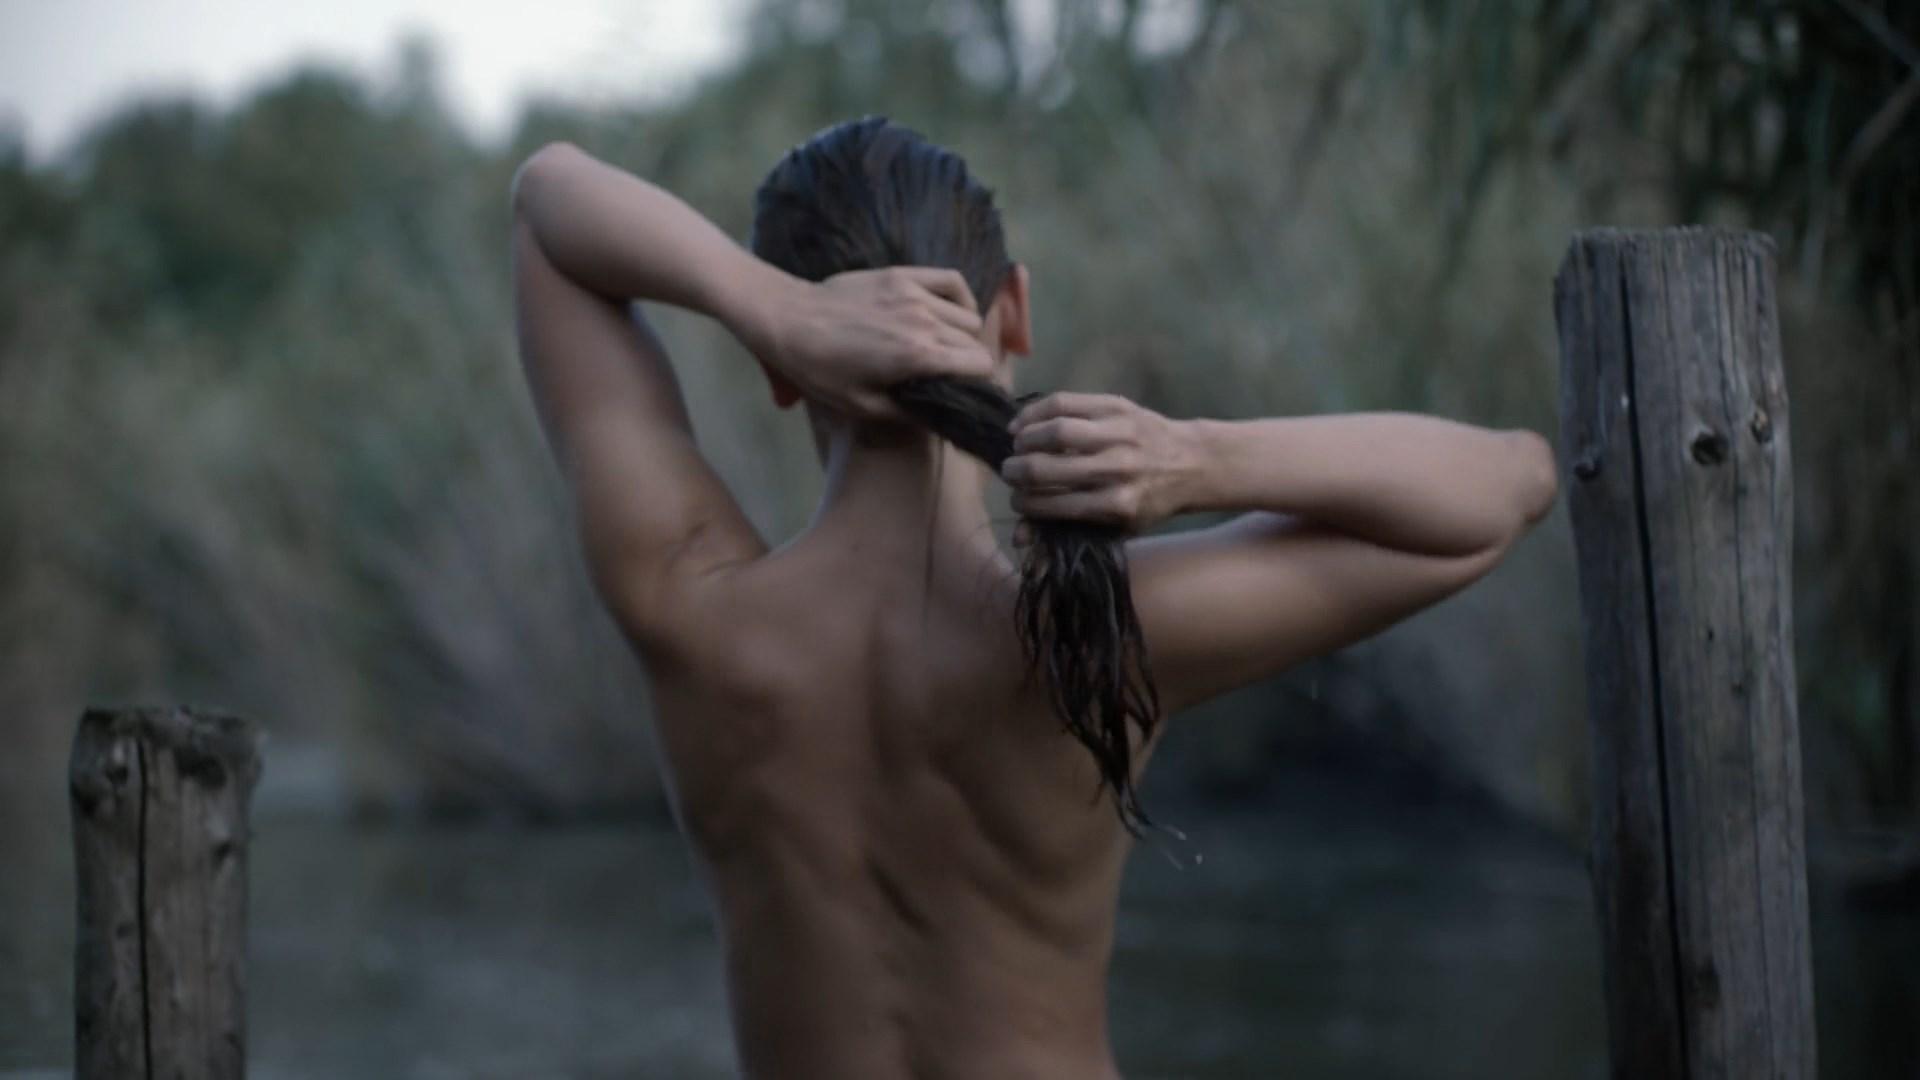 Watch Peri Baumeister Nude video